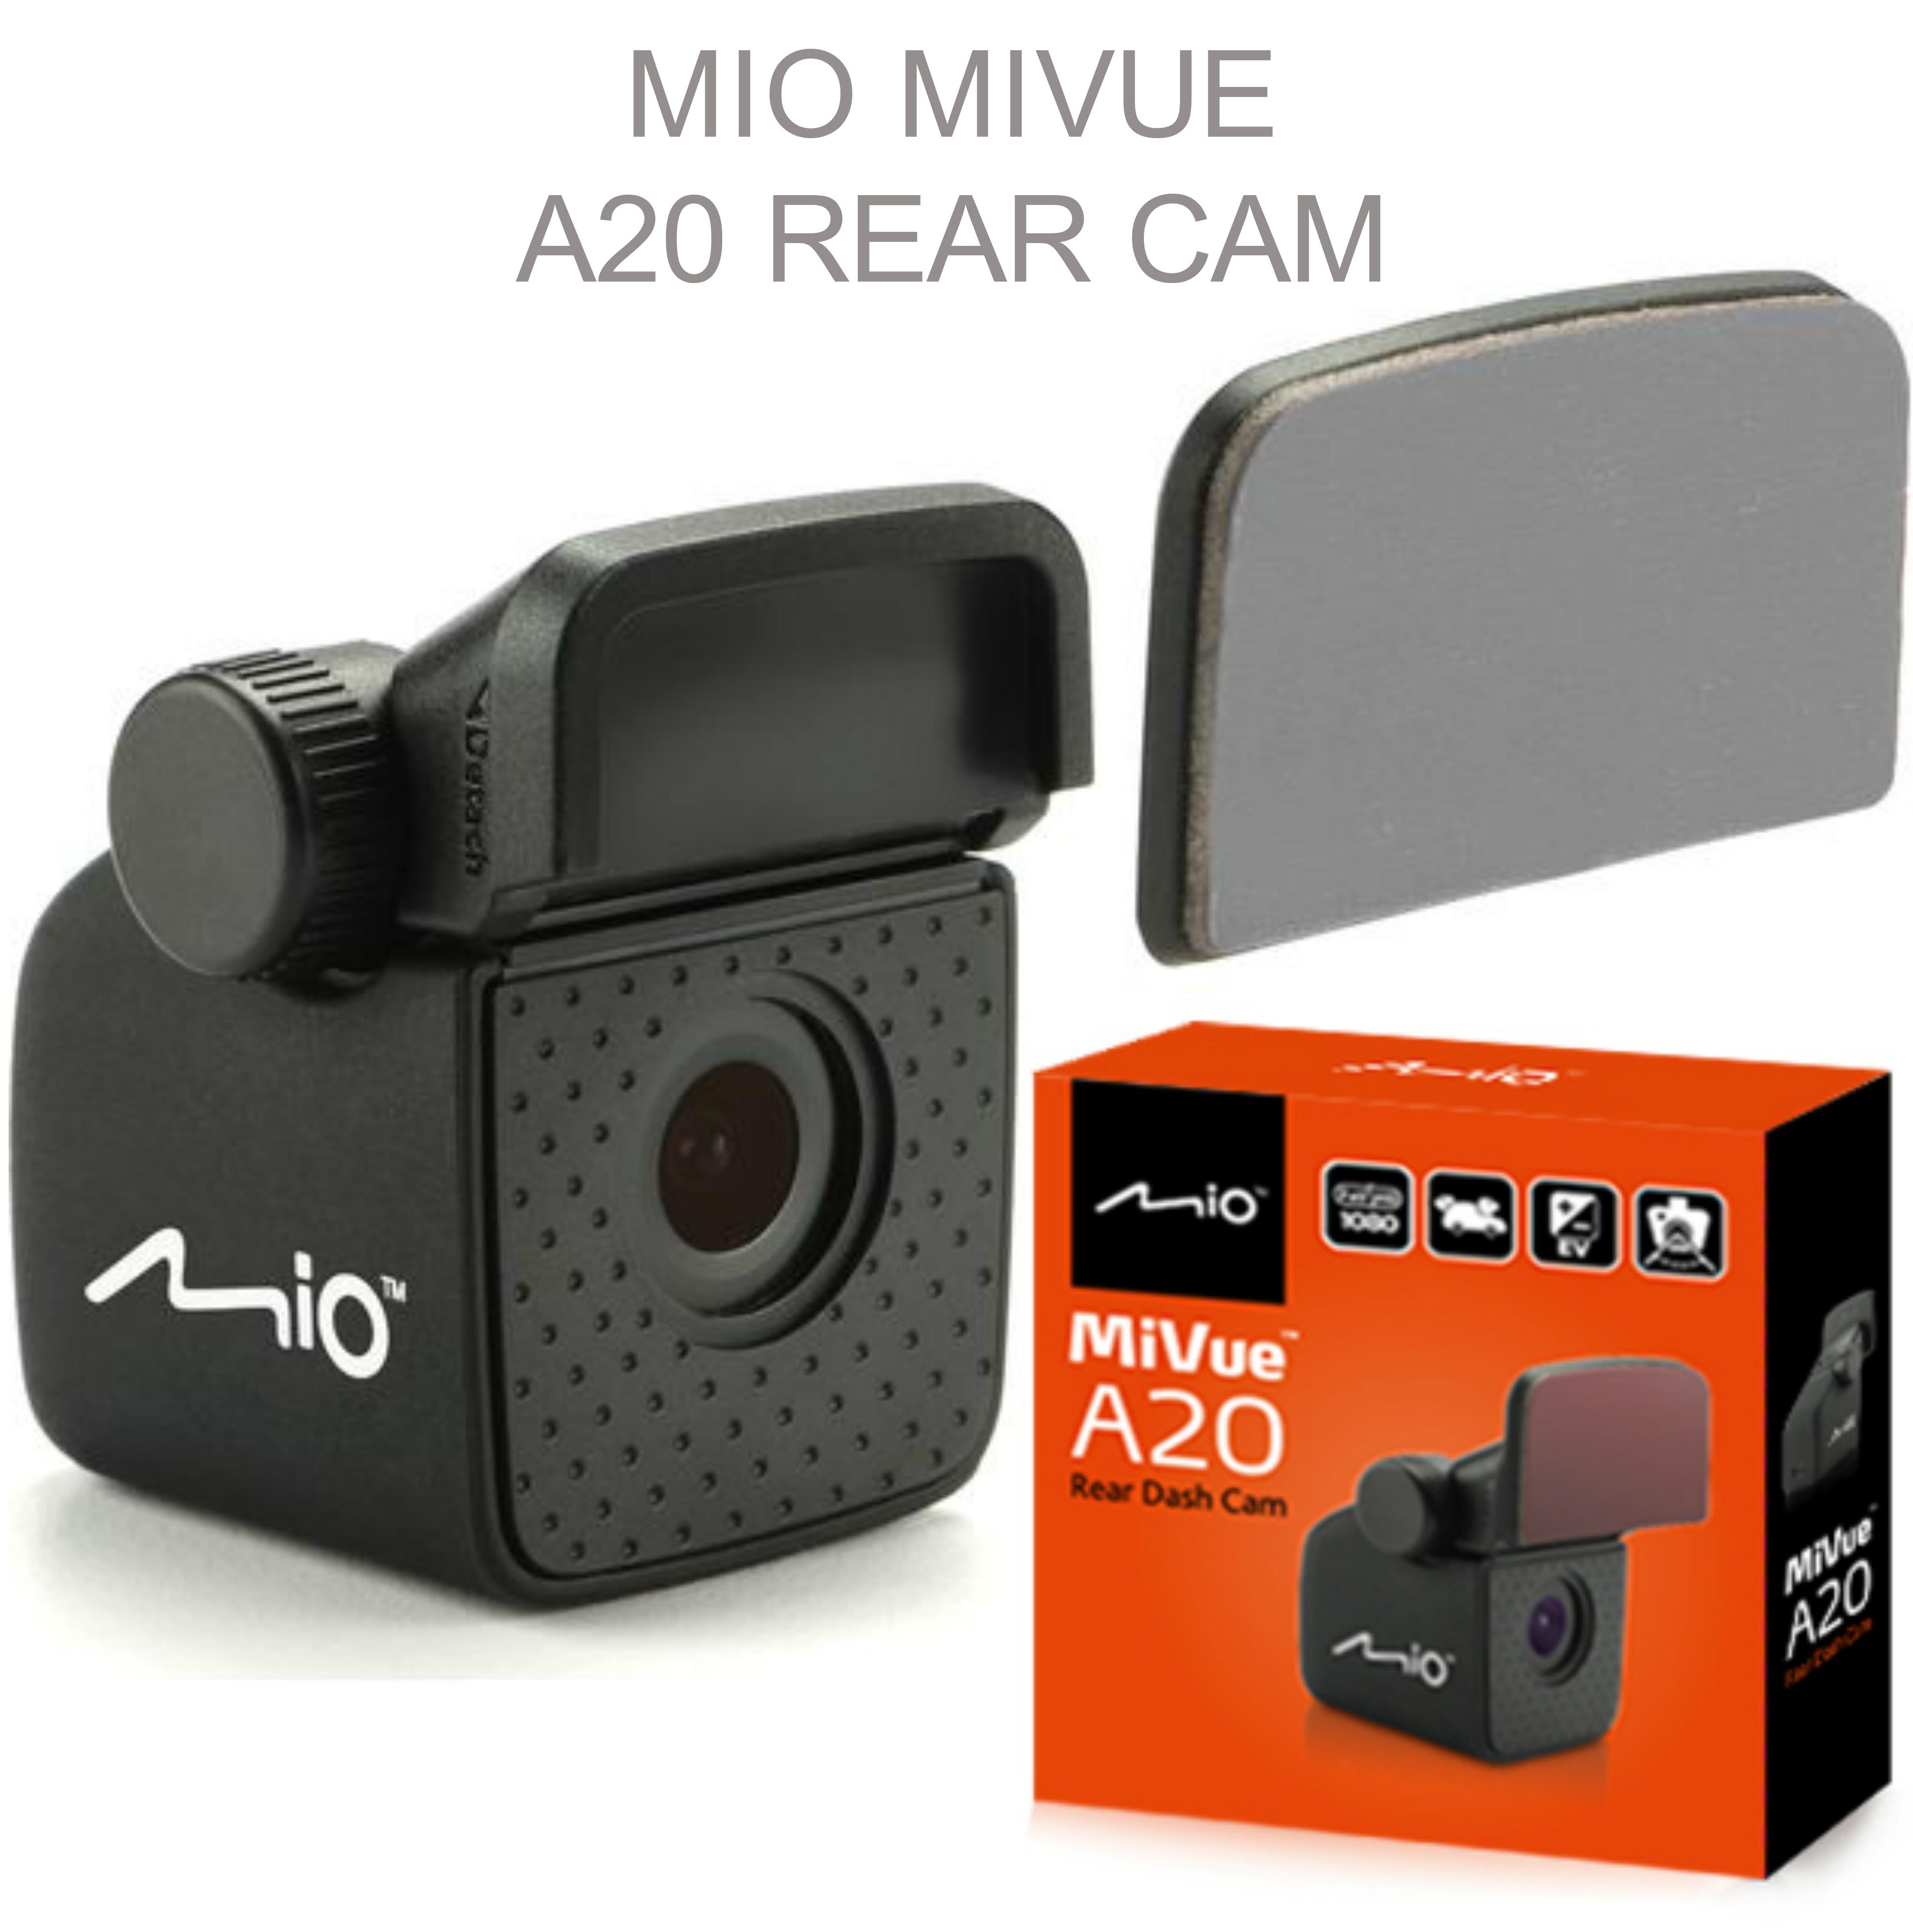 Mio A20 In Car Rear Dash Camera?Recording For Mivue 751/752/792/766/786/788/792